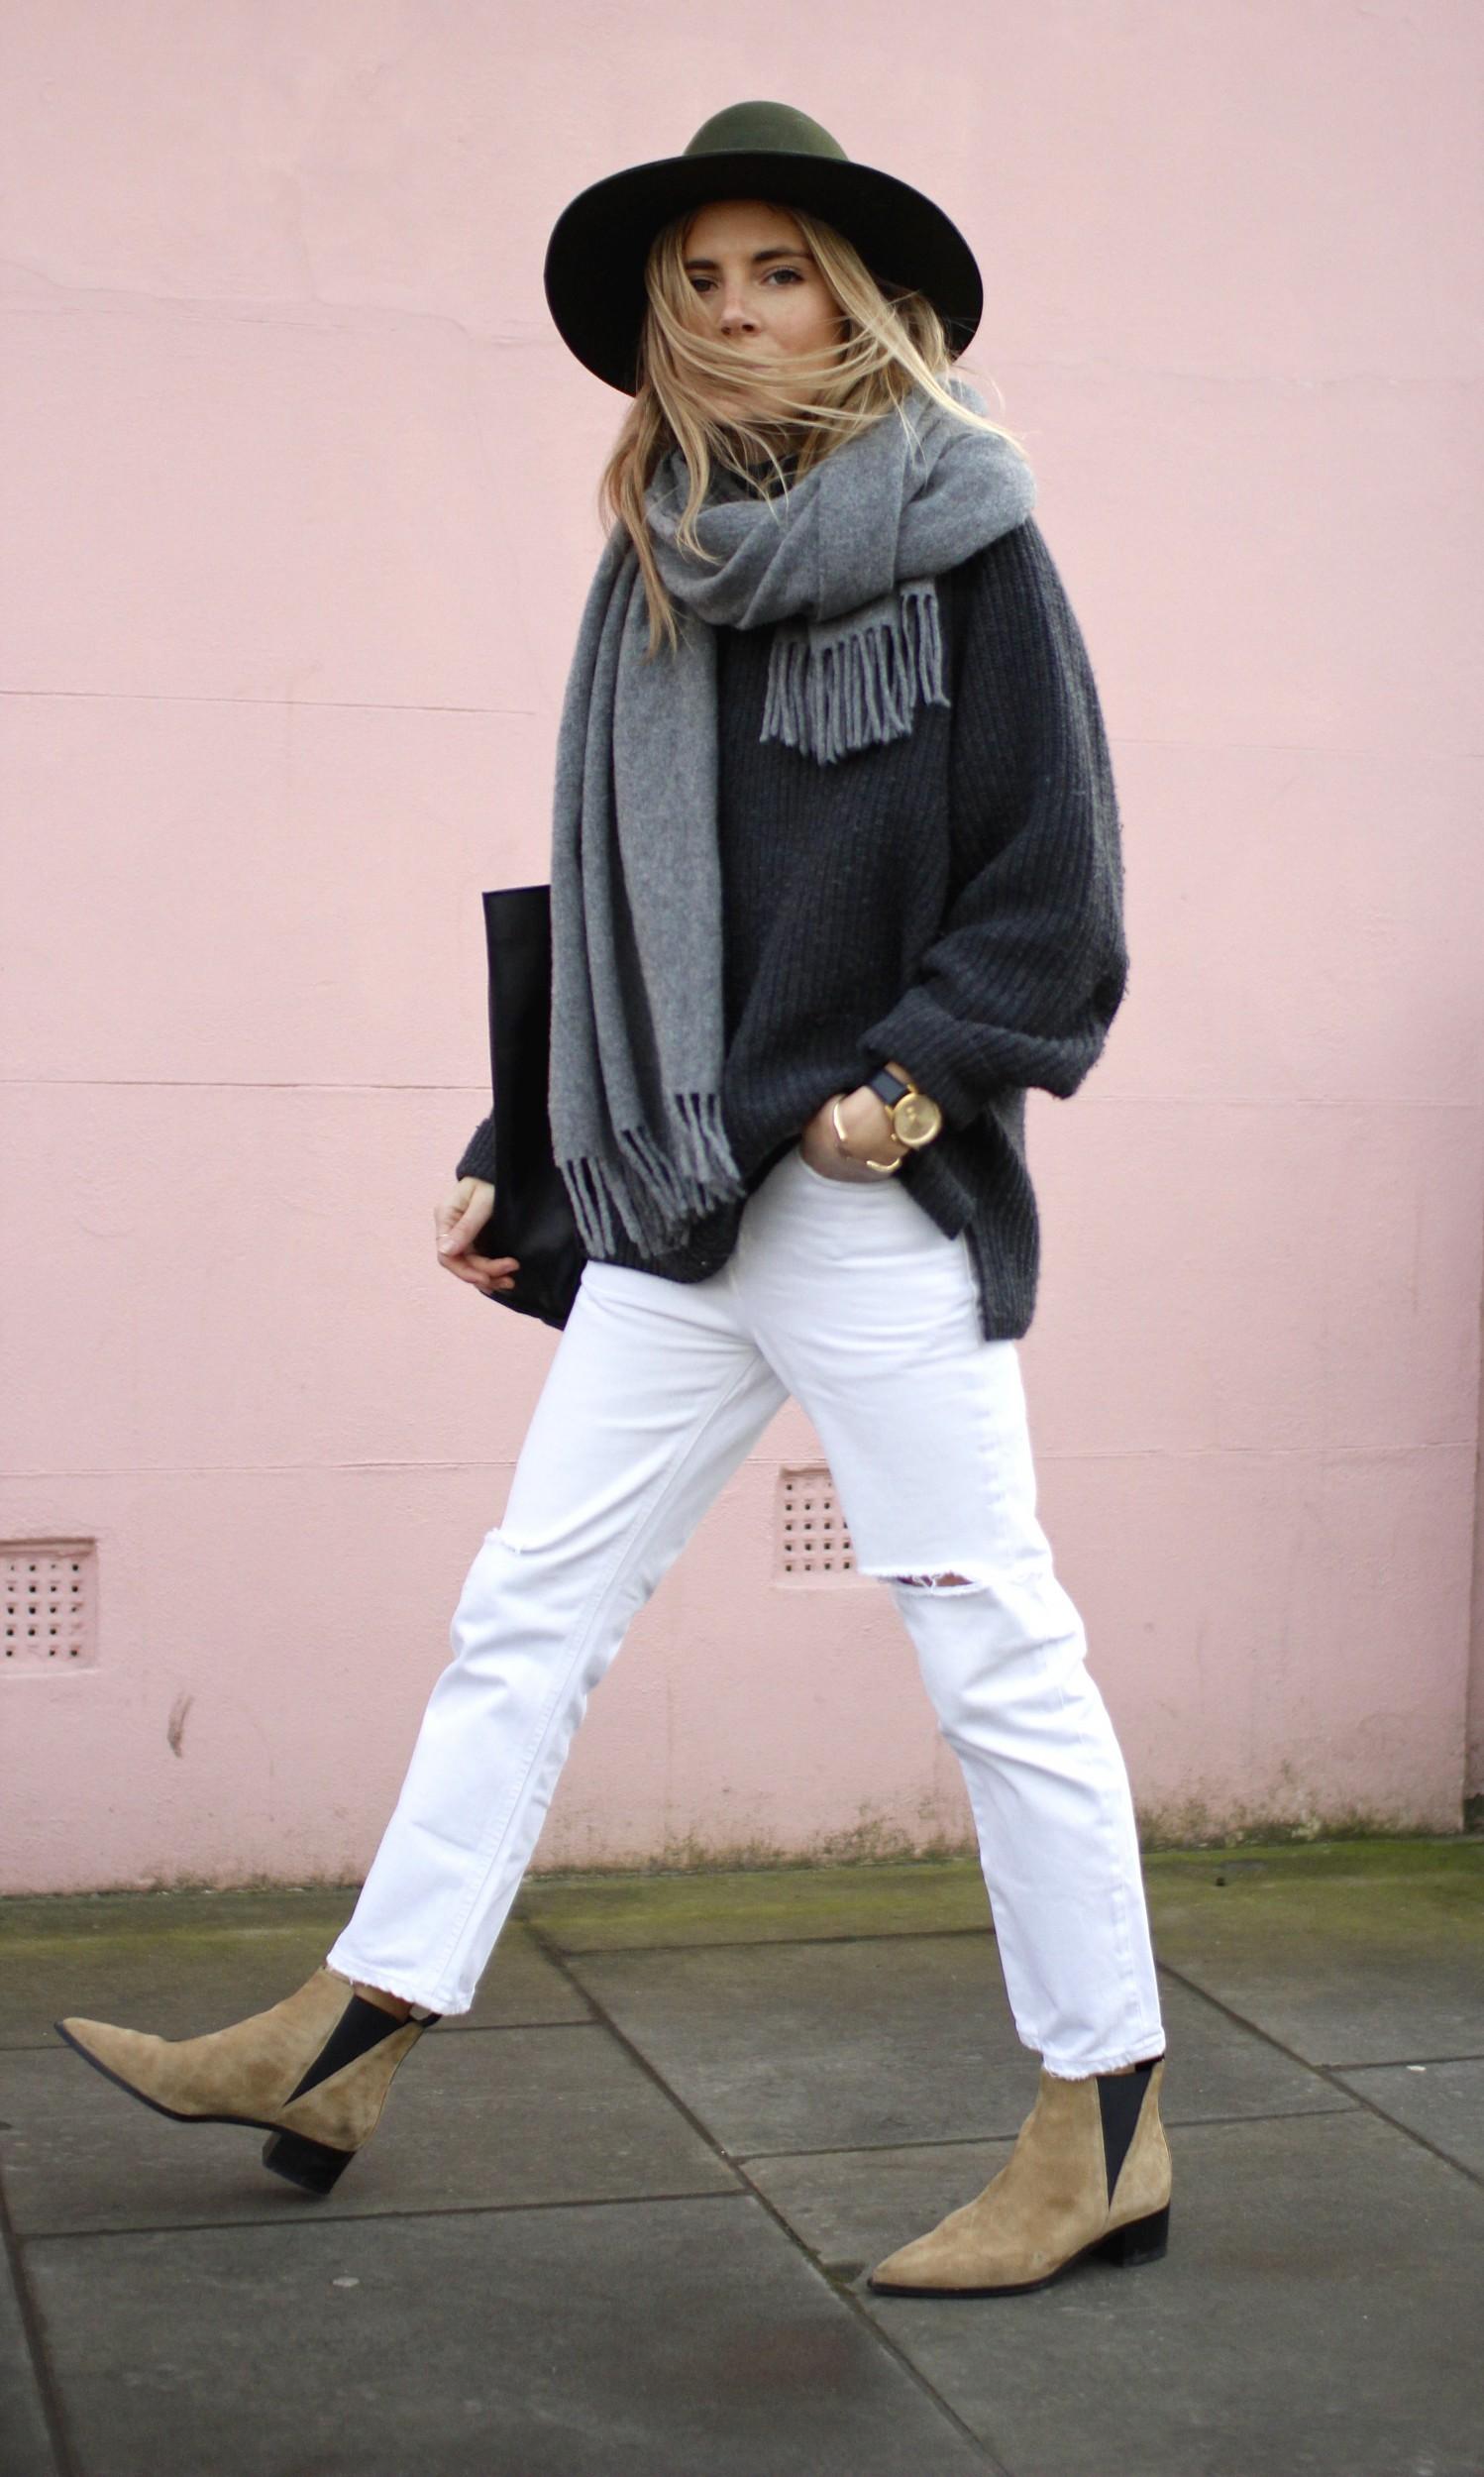 Photo: Fashion Me Now - third piece rule